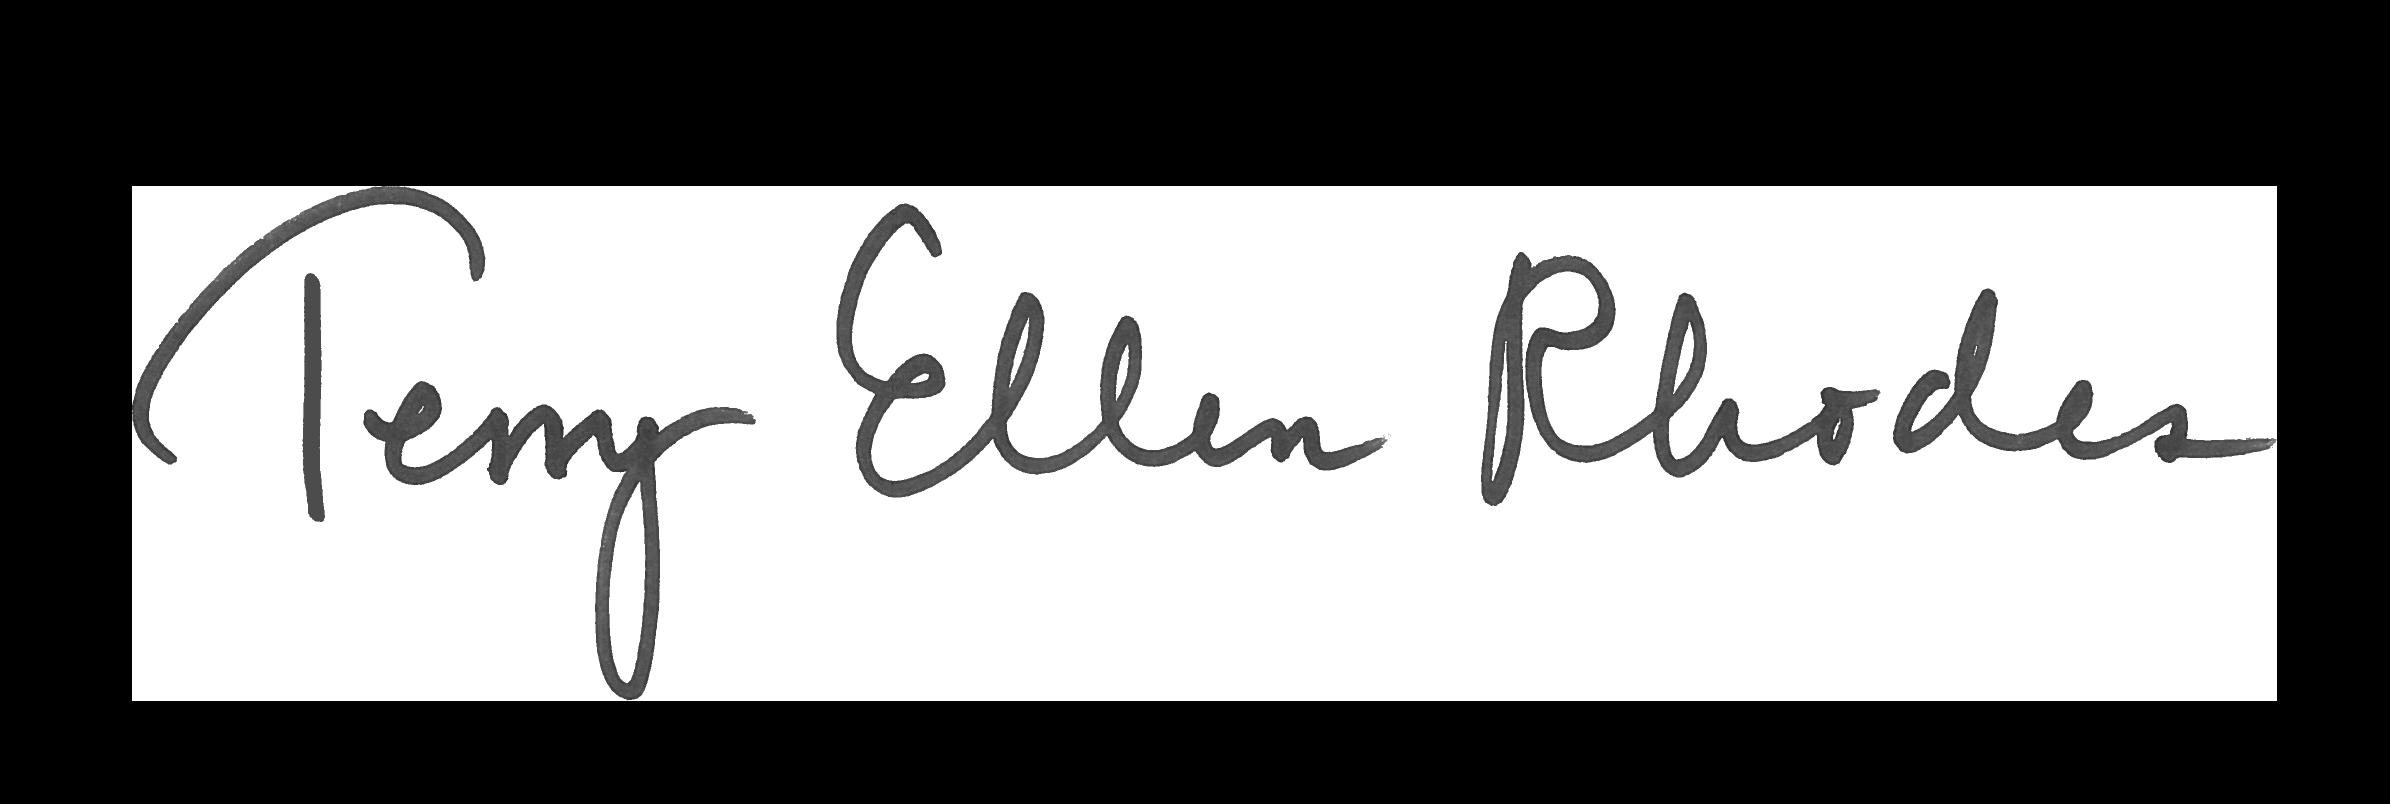 Terry Ellen Rhodes signature